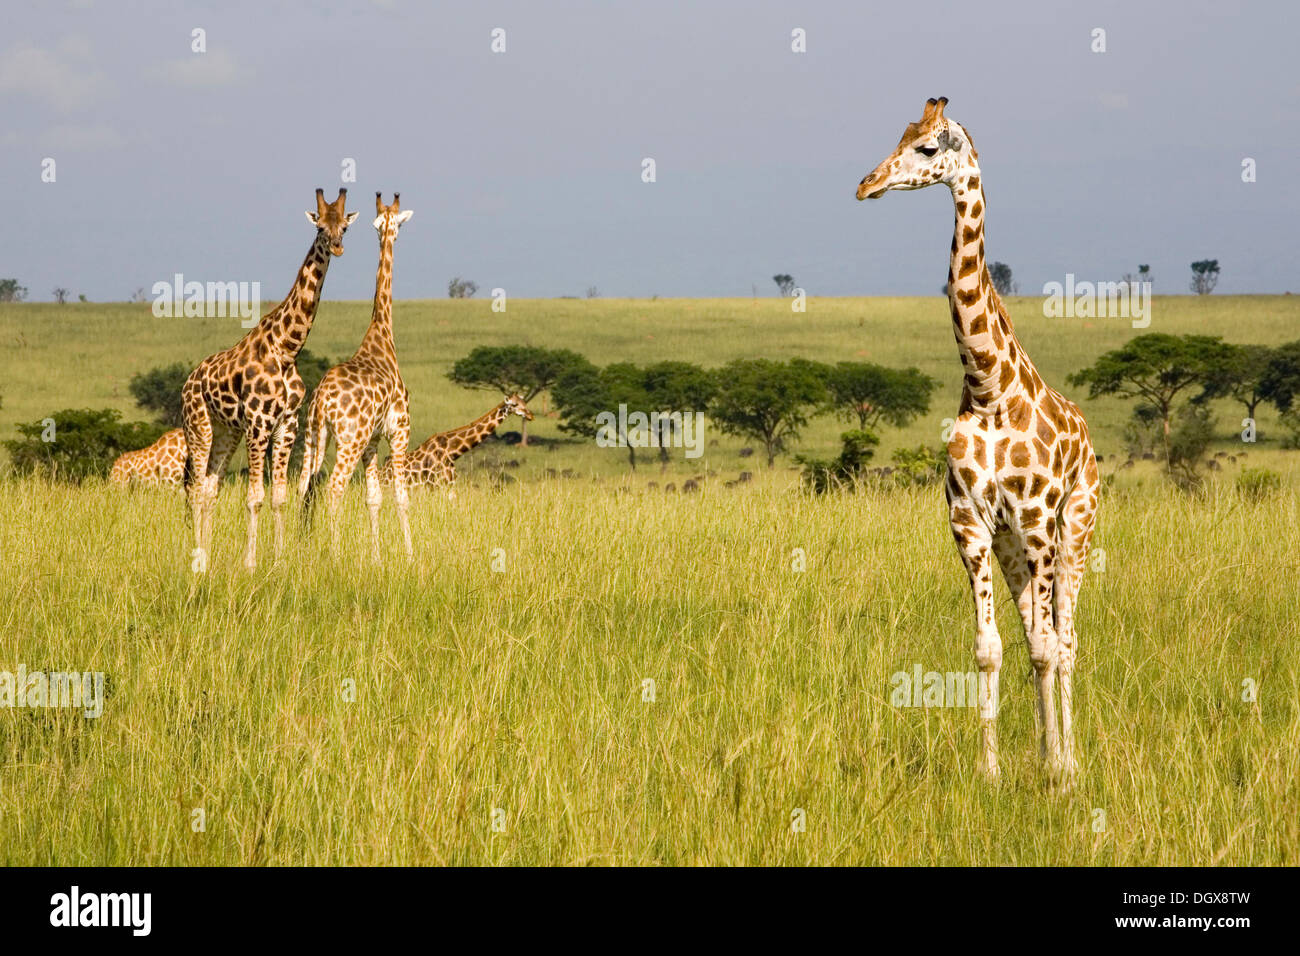 Rothschild or Ugandan Giraffes (Giraffa camelopardalis), critically endangered subspecies, in the savannah of the Murchison - Stock Image